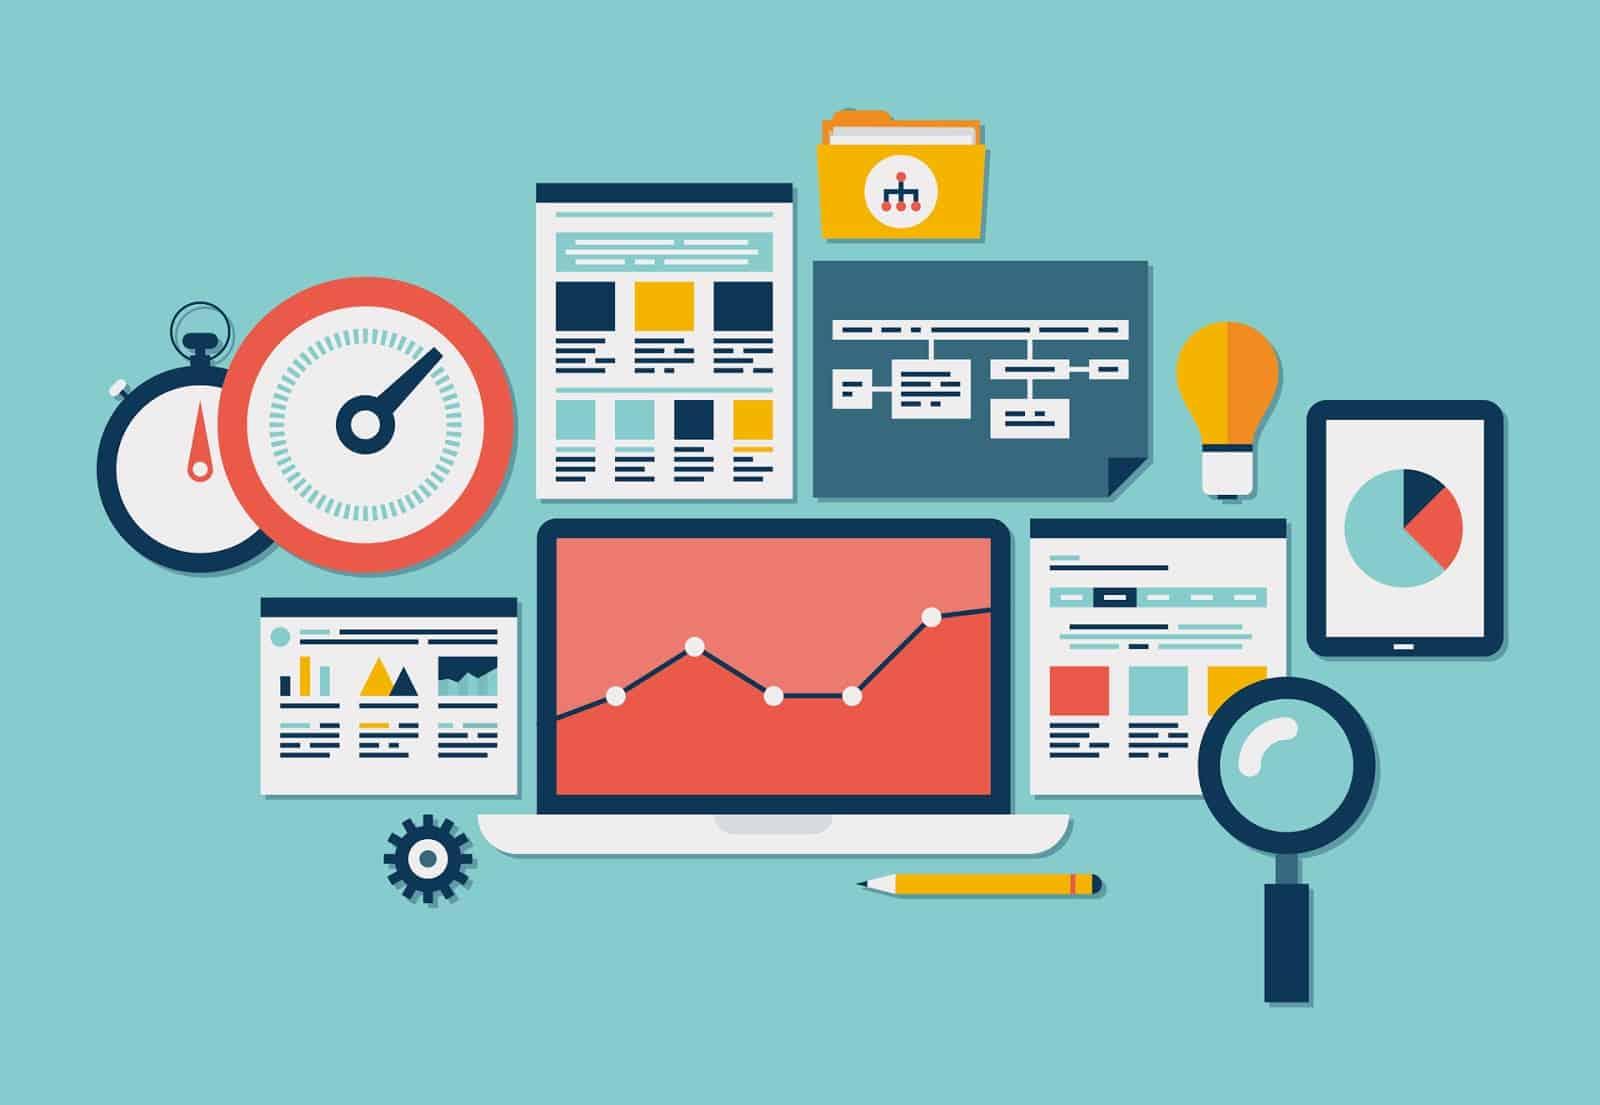 Build Your Business Standard Operating Procedures